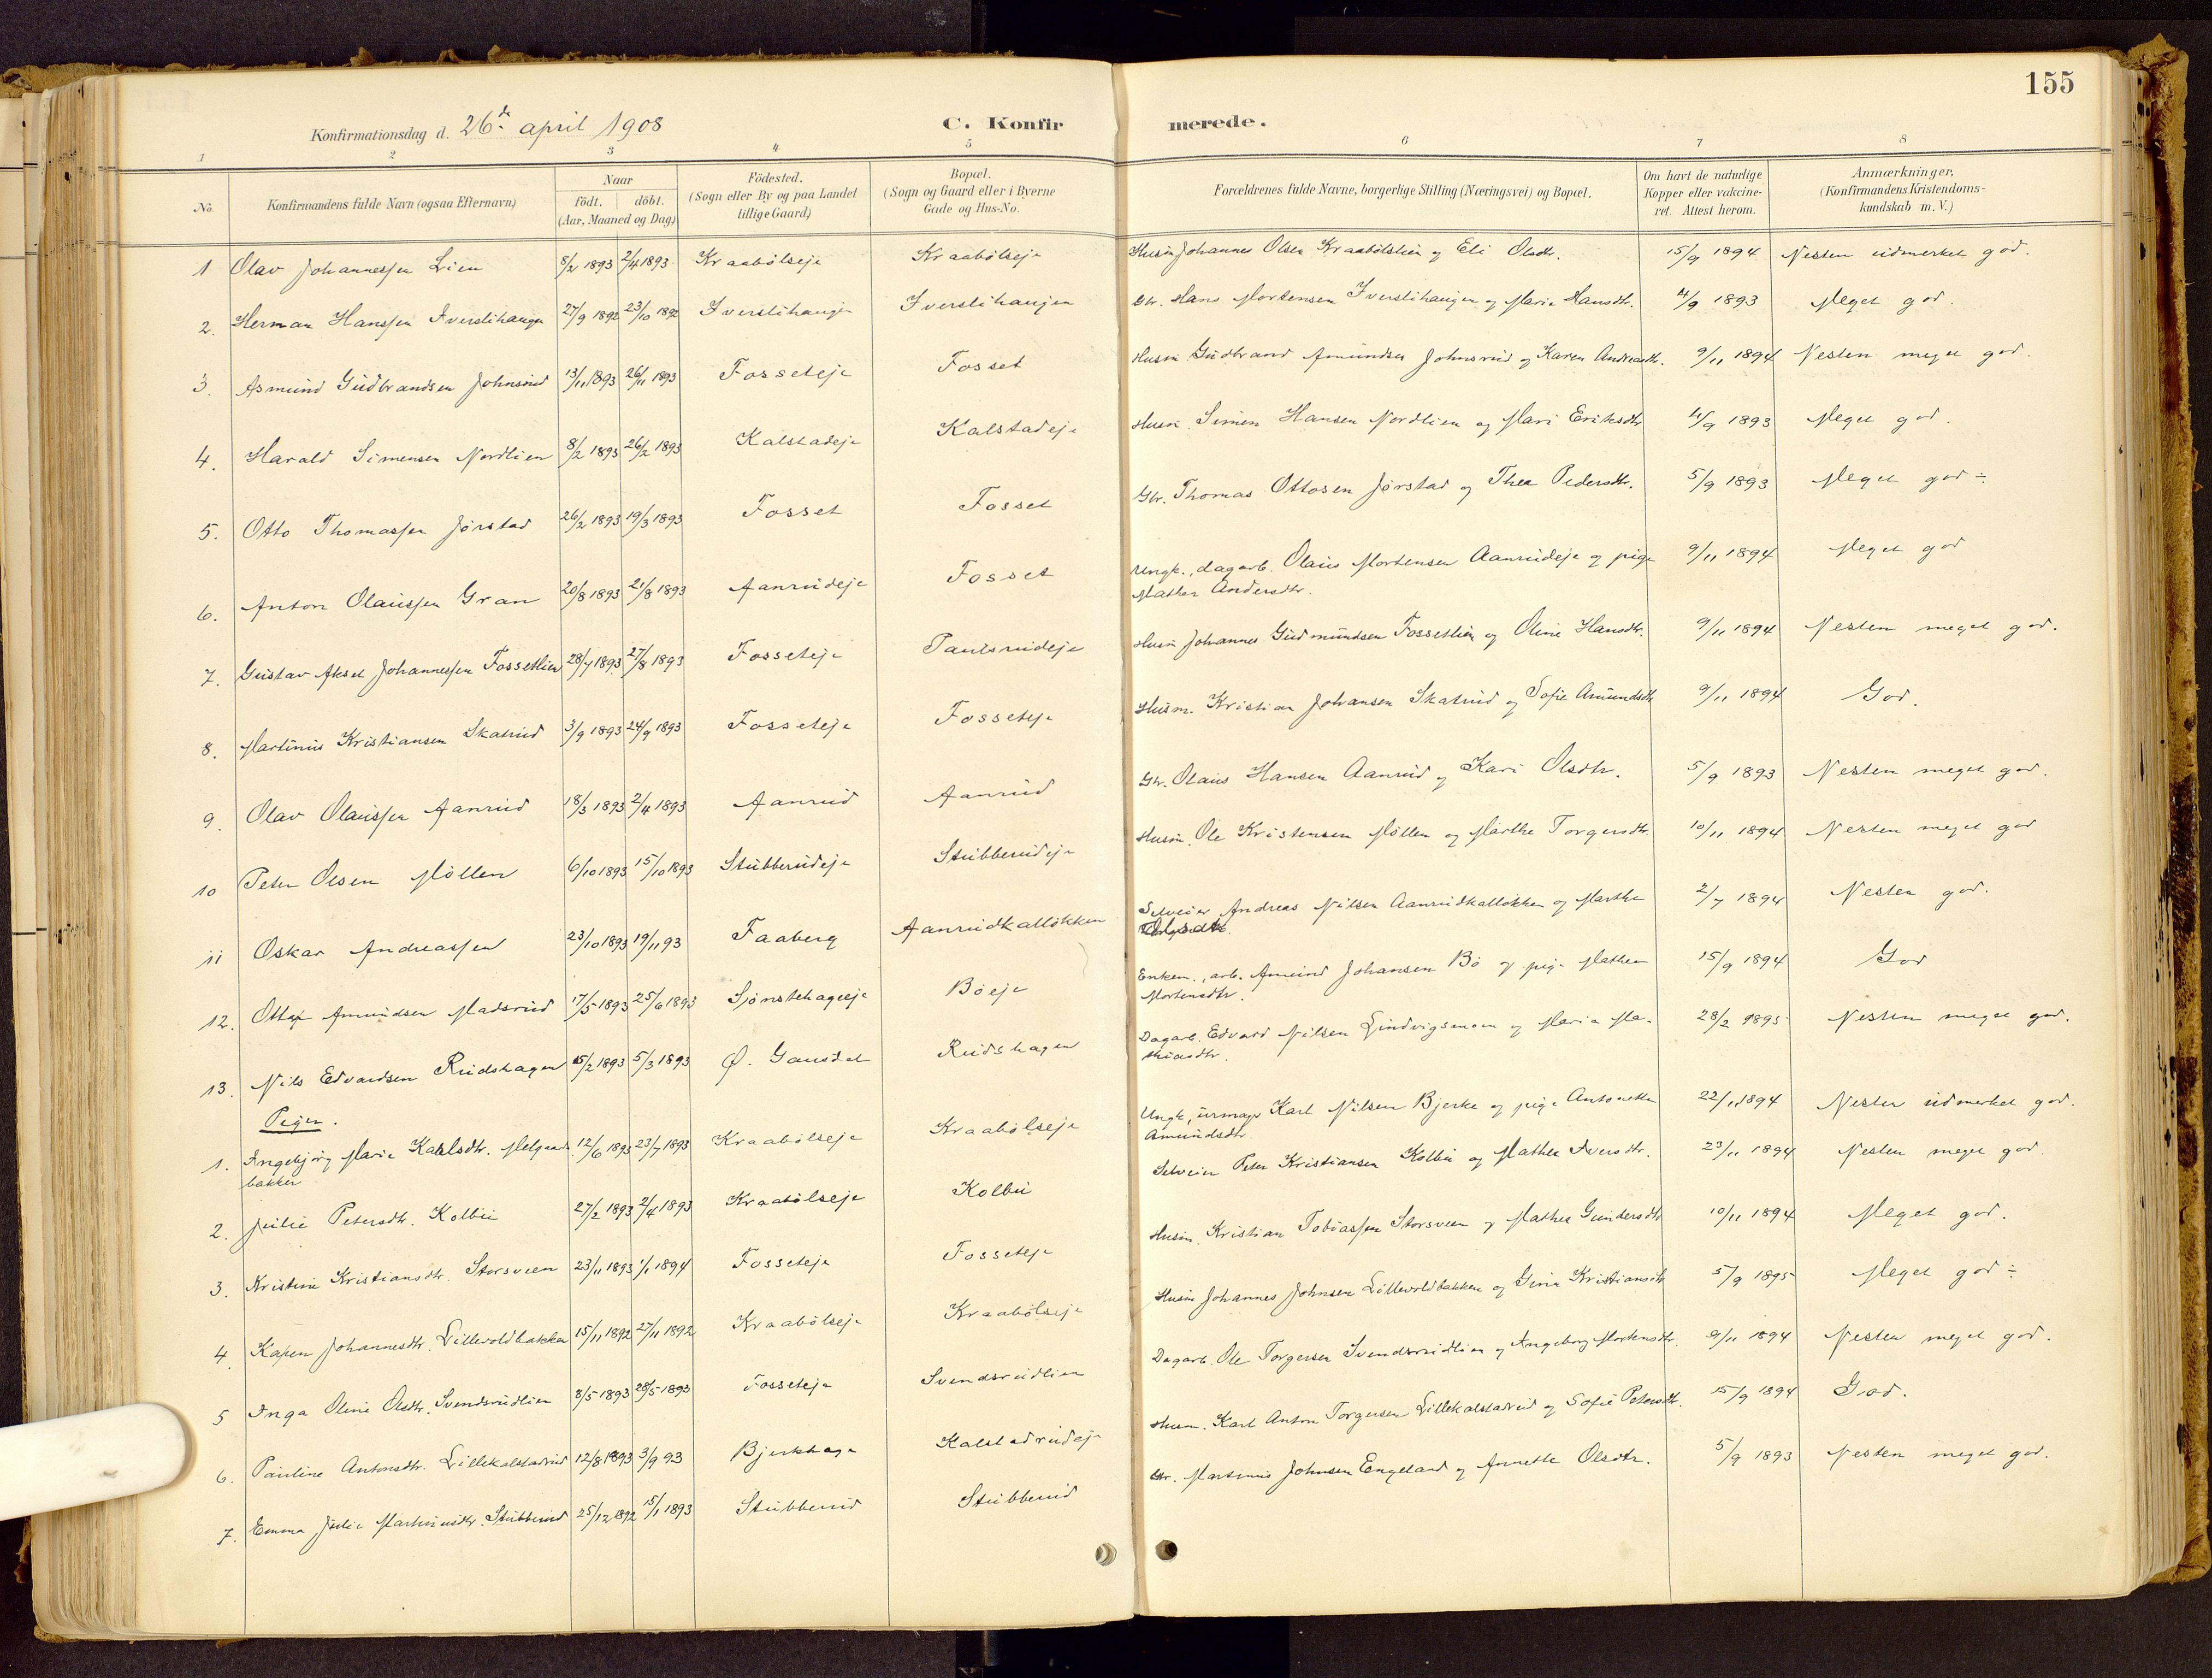 SAH, Vestre Gausdal prestekontor, Ministerialbok nr. 1, 1887-1914, s. 155